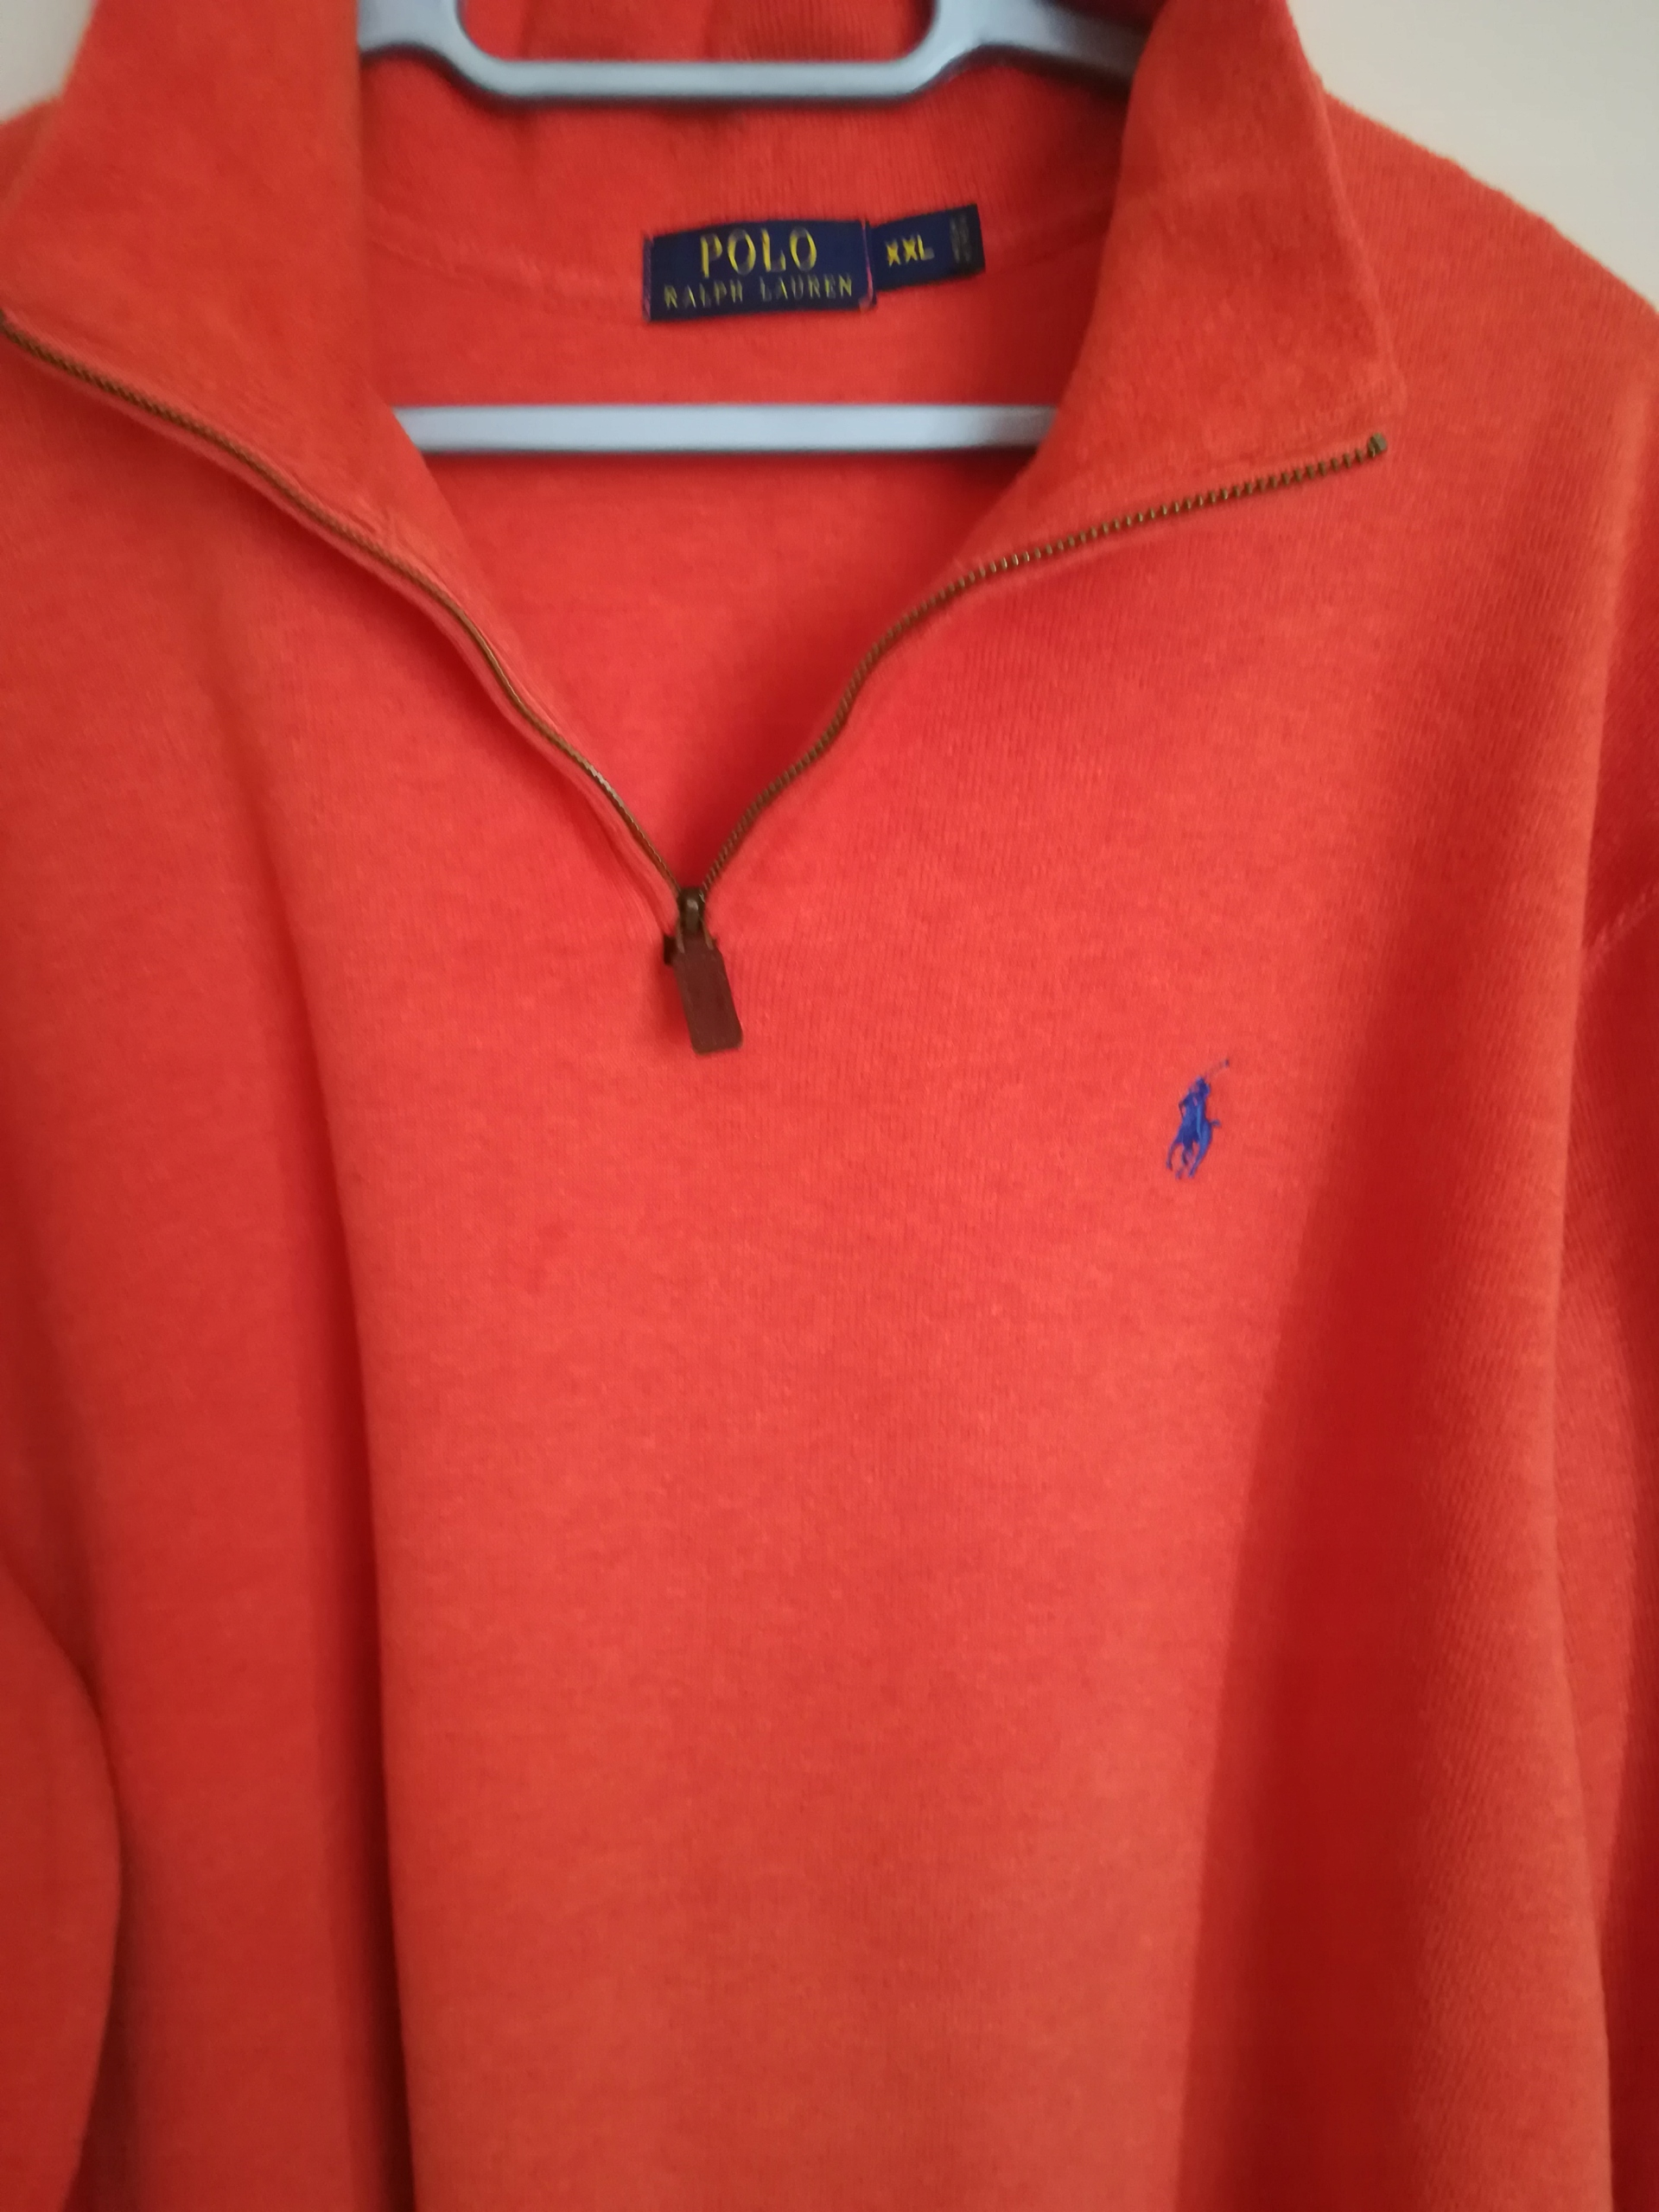 Ralph Lauren świetny sweter męski XXL